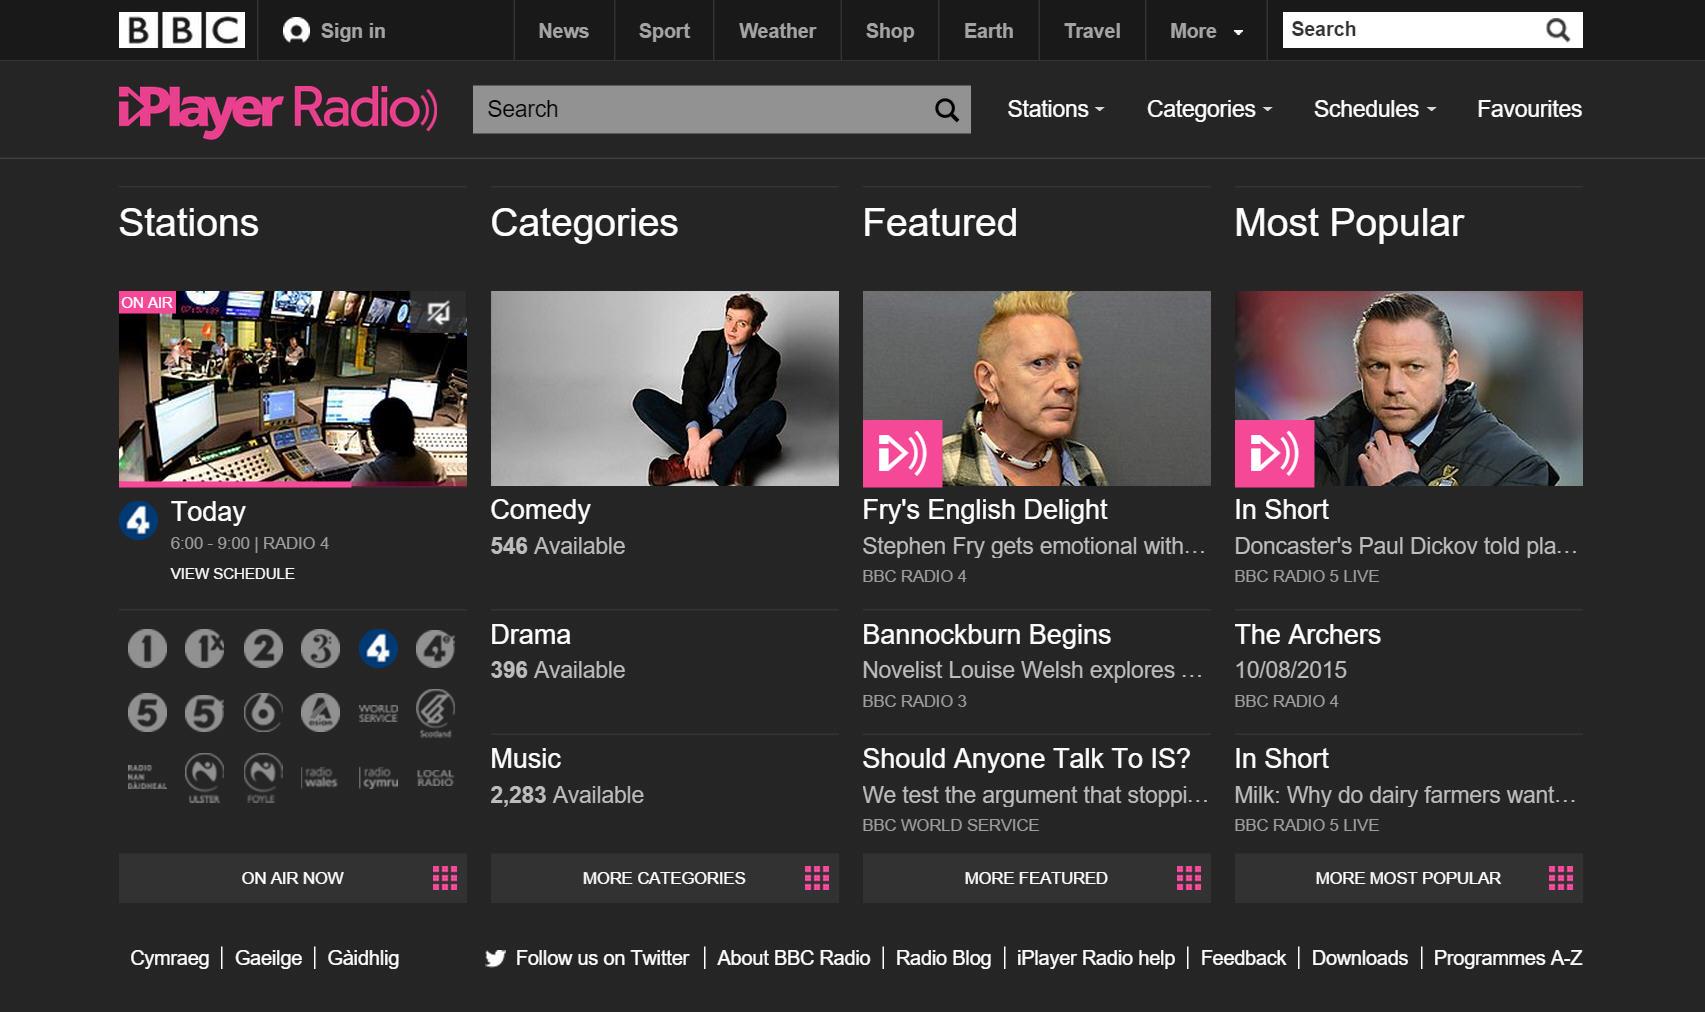 BBC iPlayer Radio hits one million downloads | BetaNews